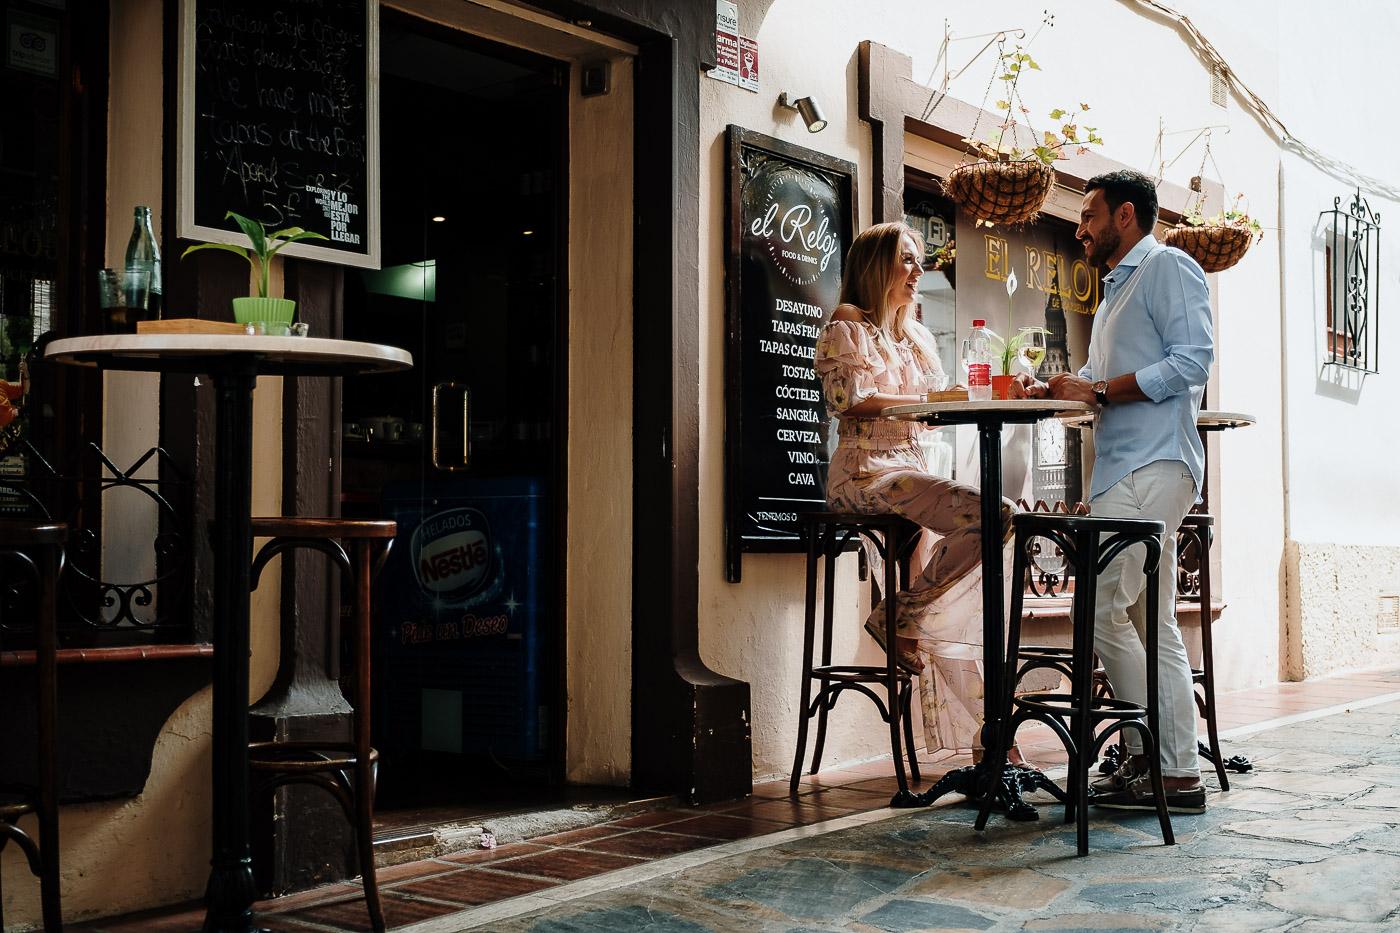 Preboda-Marbella-fotografo-top-Bodas-Malaga-manuel-fijo